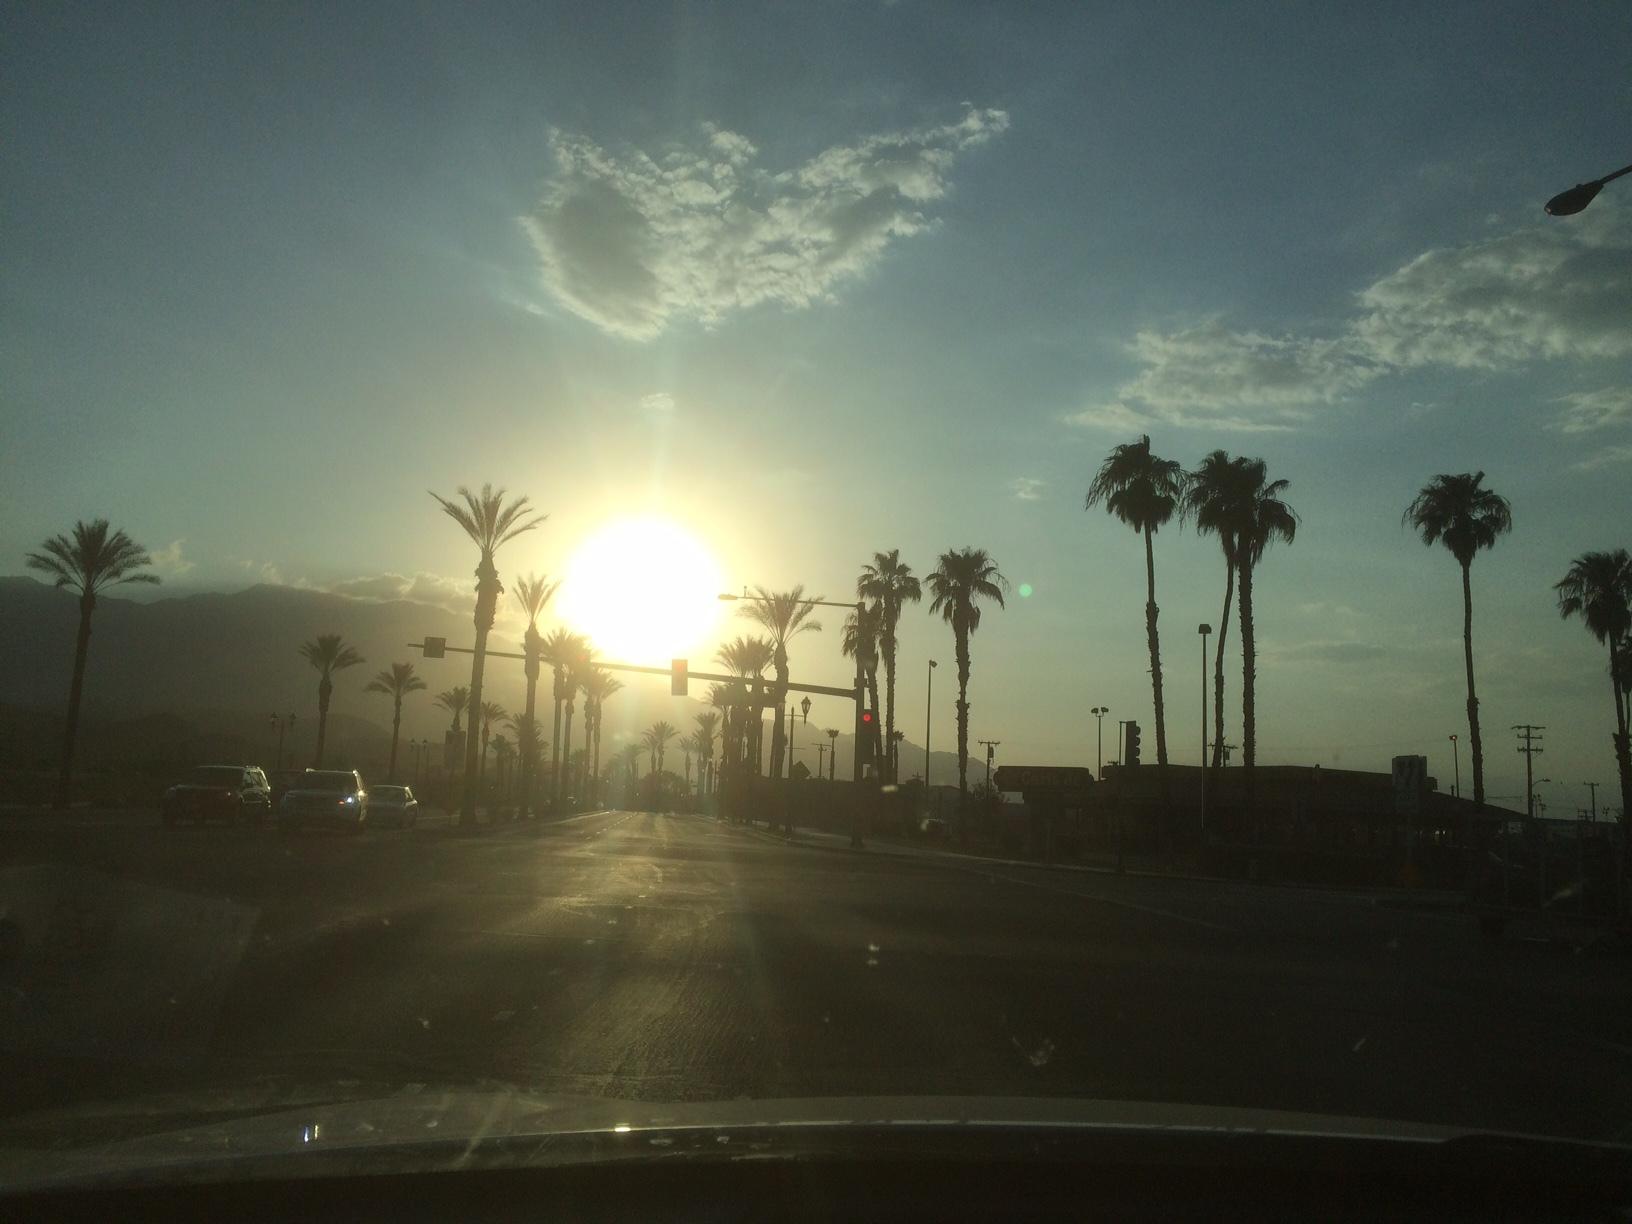 hastighet dating San Diego ca